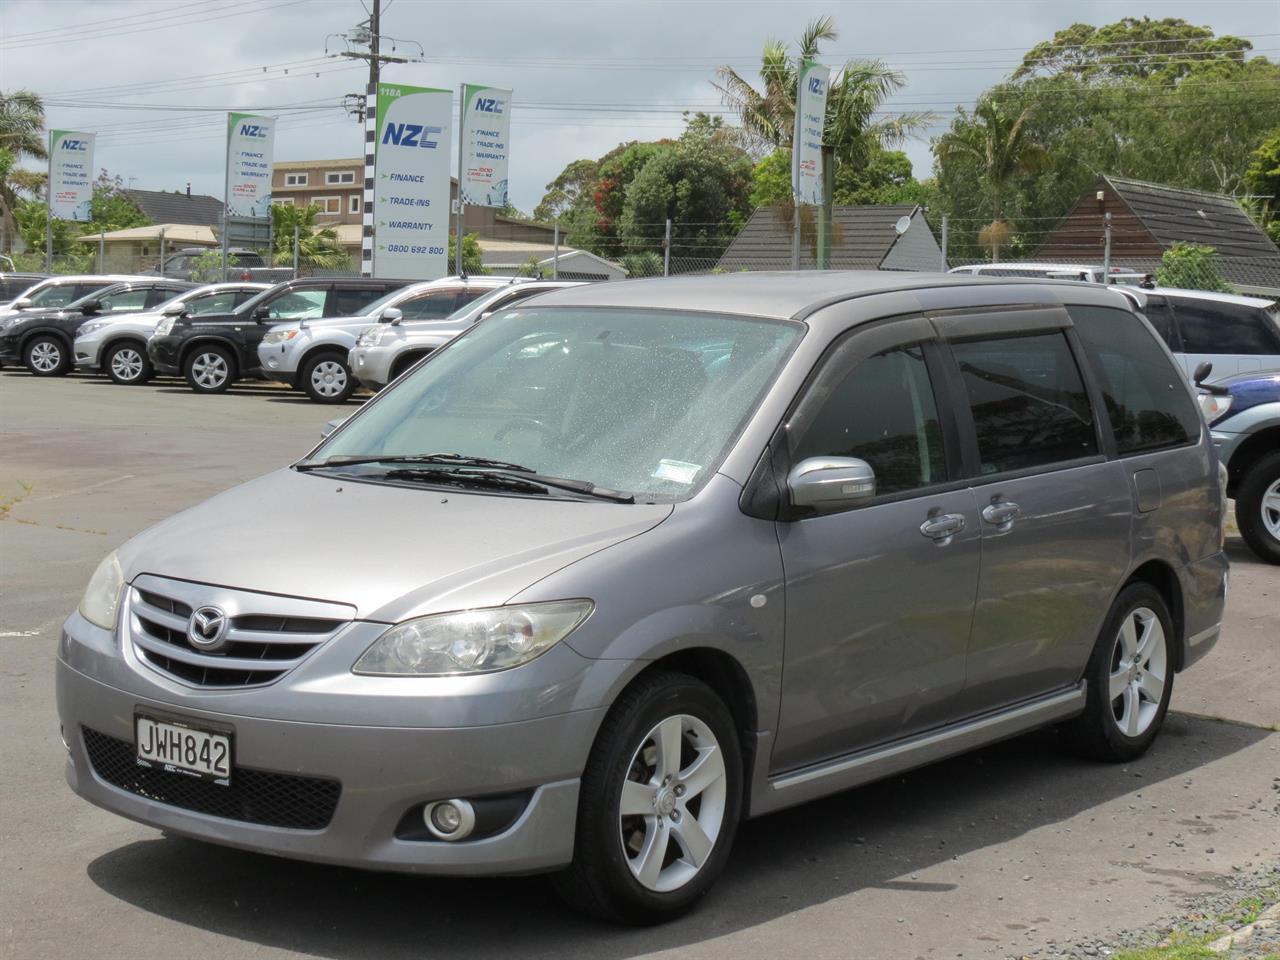 2005 Mazda MPV   only $14 weekly